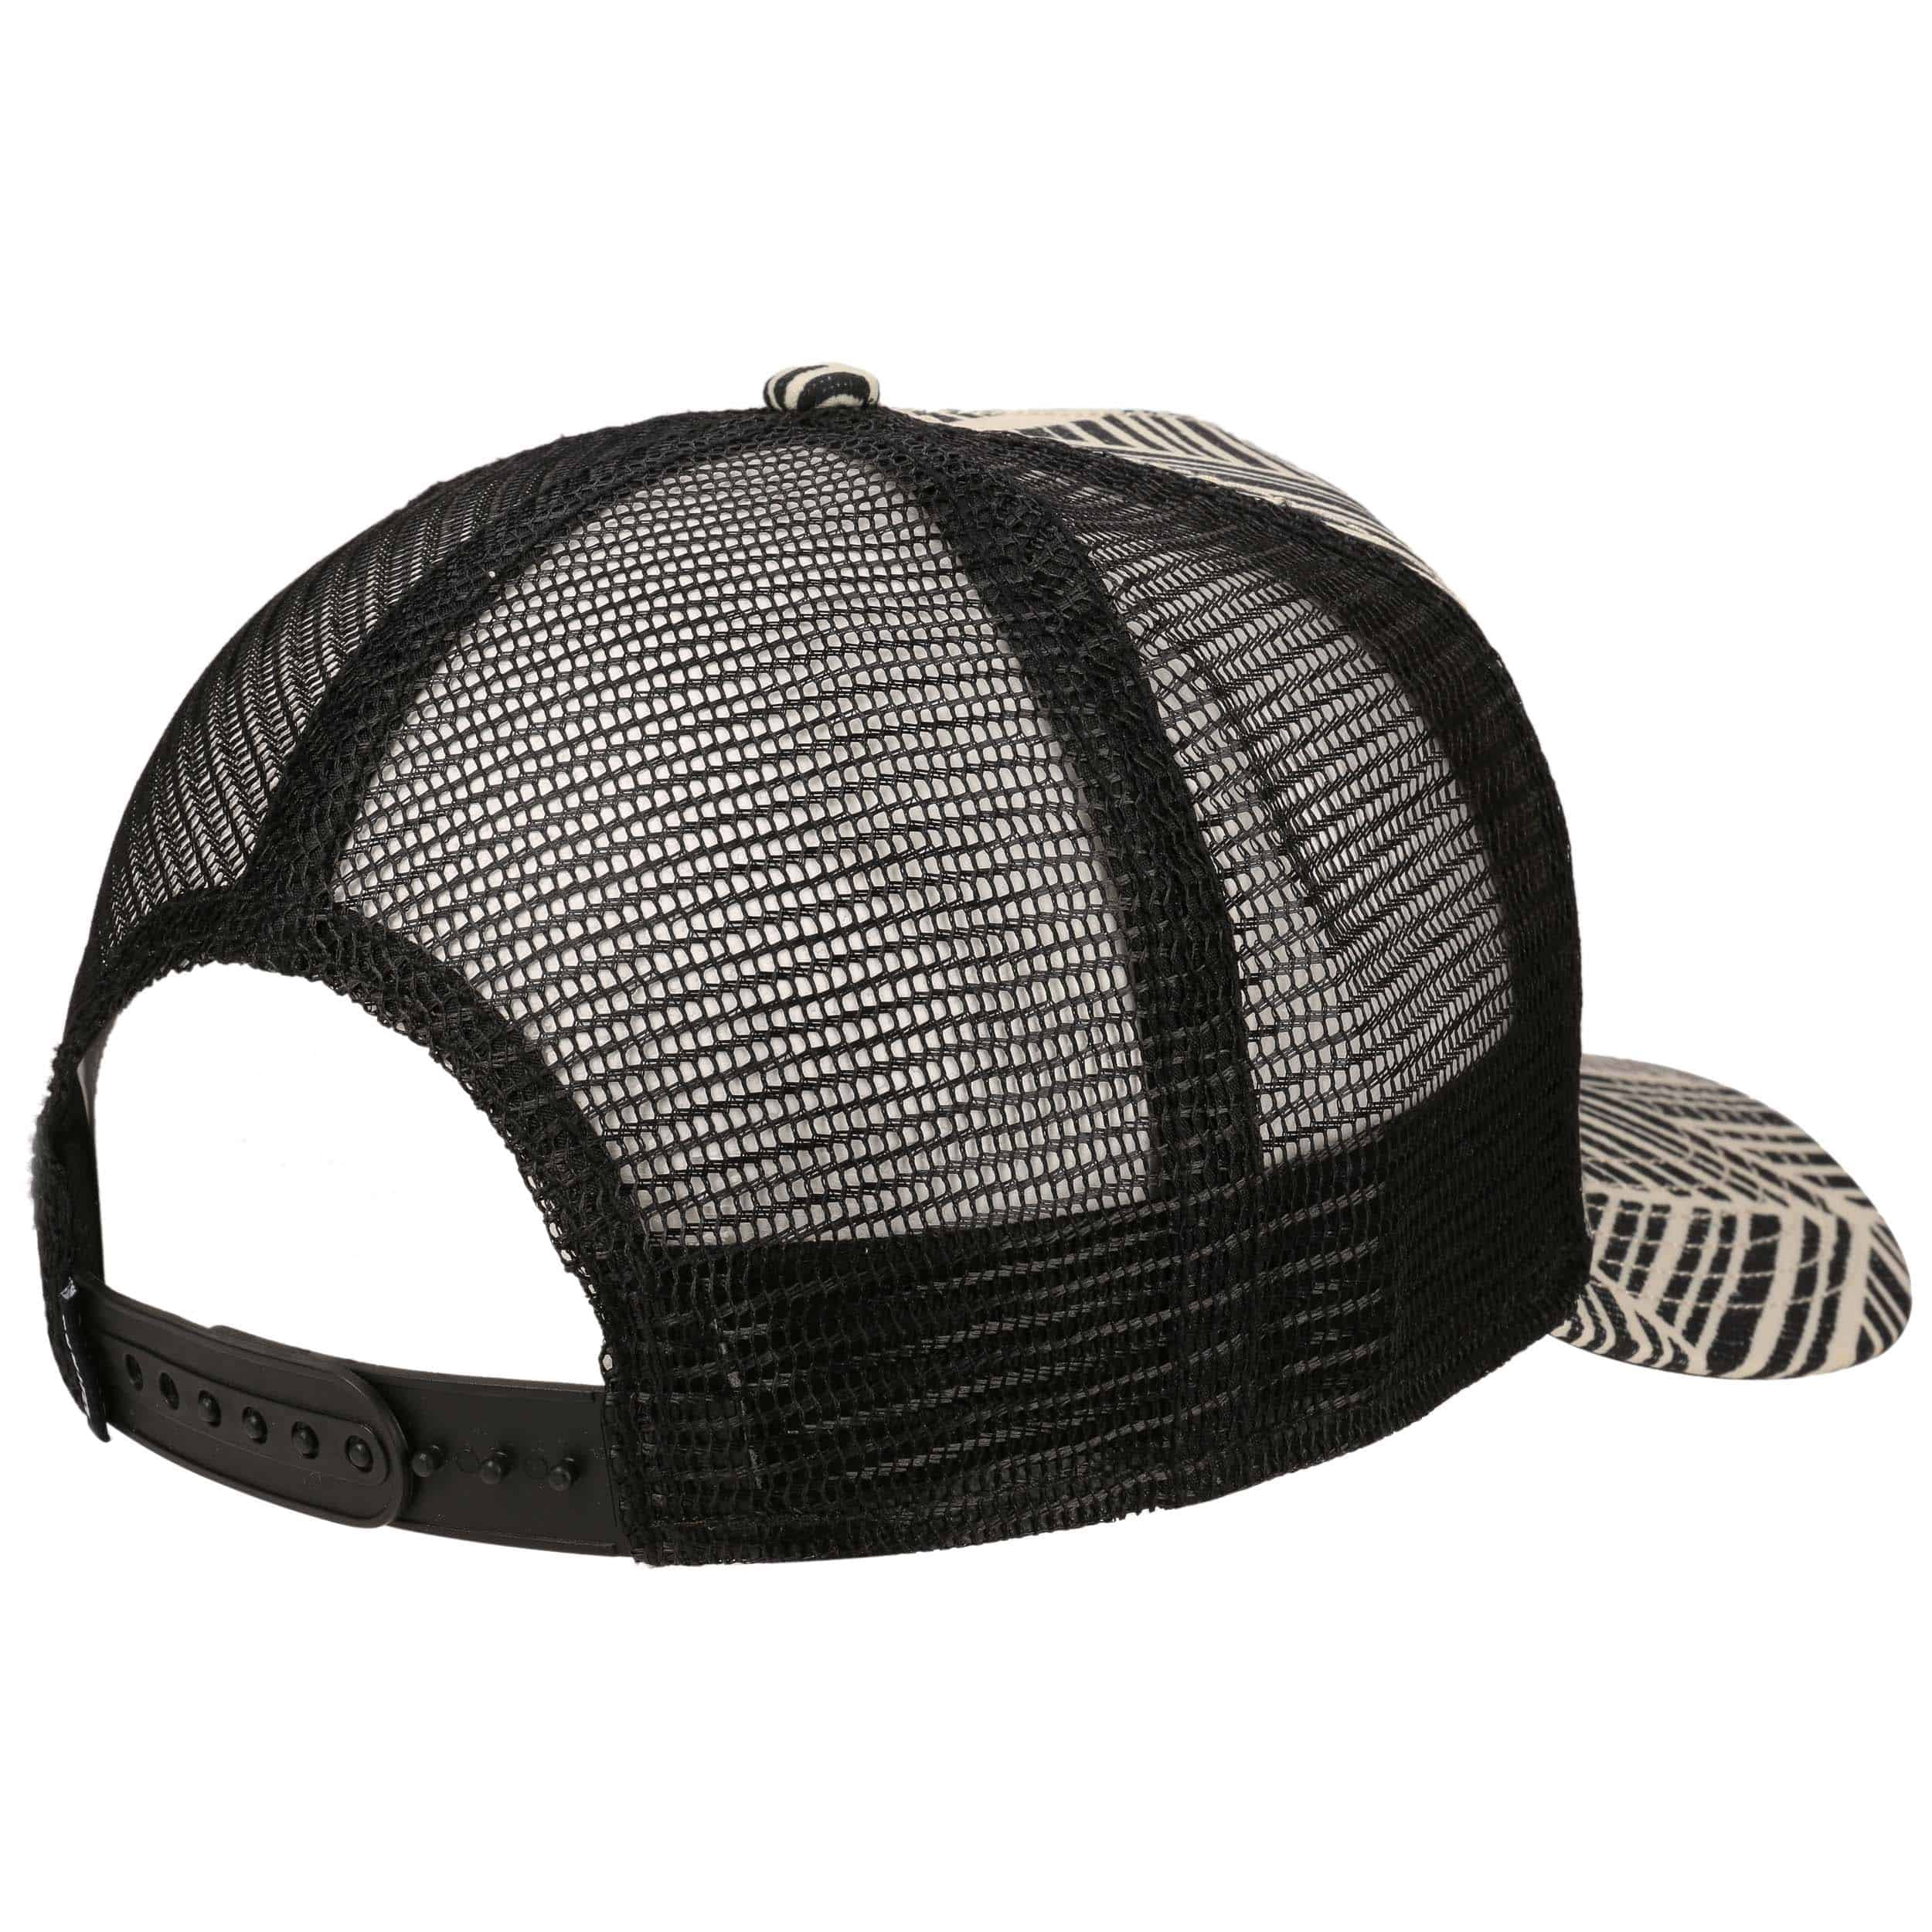 alopa hft trucker cap by djinns gbp 22 95 hats caps. Black Bedroom Furniture Sets. Home Design Ideas